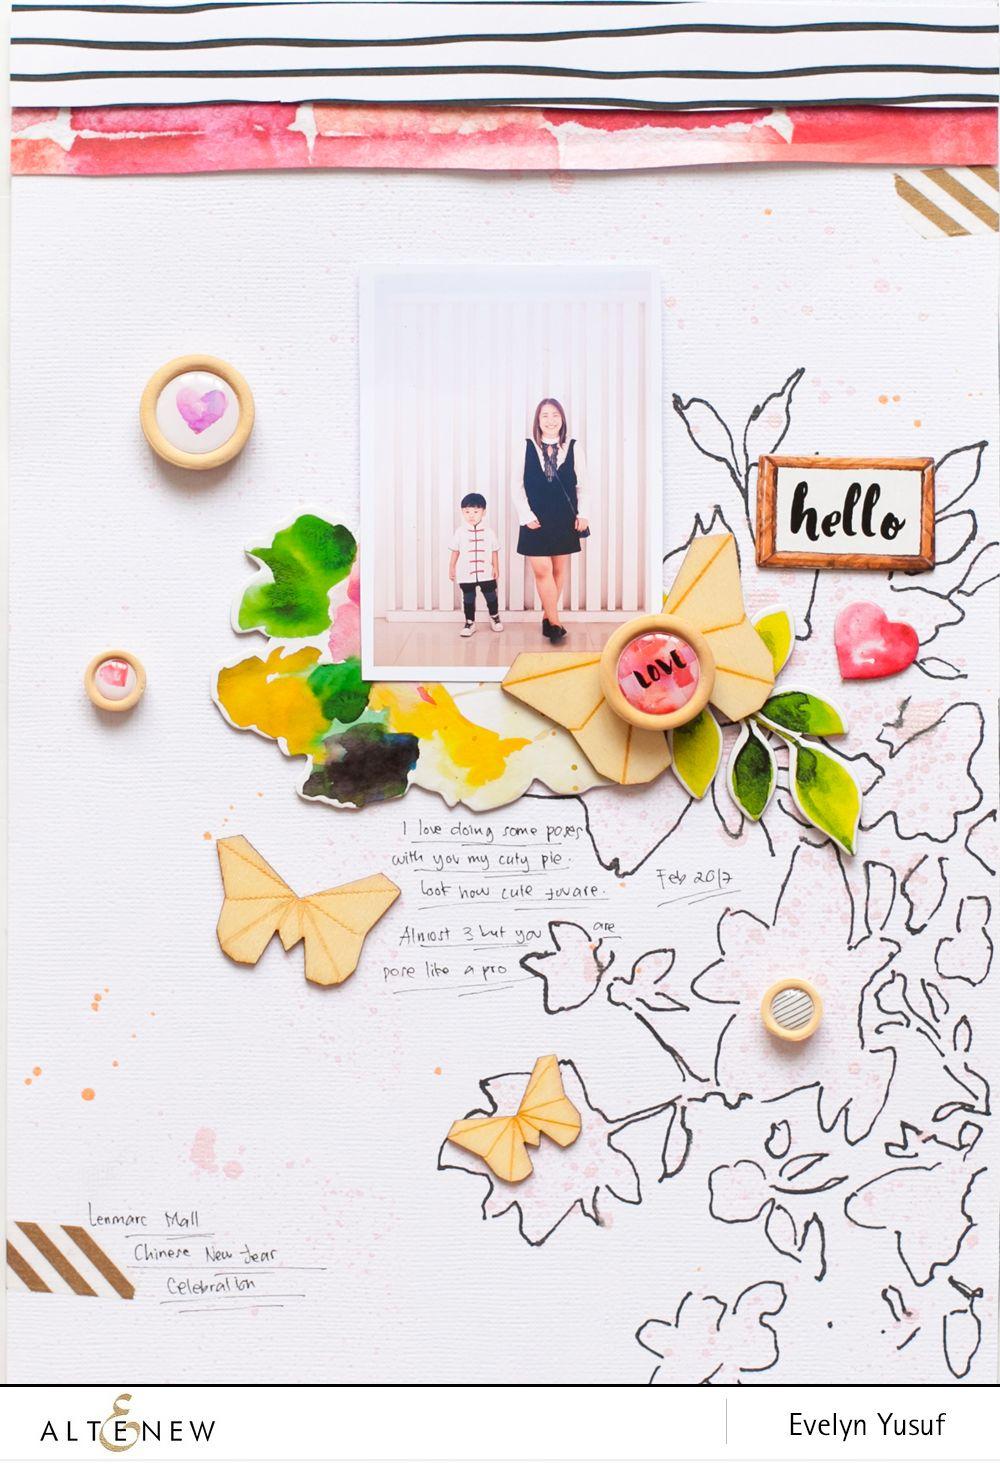 Create your own scrapbook - Altenew Stencils Ink Sprays Release Blog Hop Giveaway Create Your Ownthe Flowersscrapbook